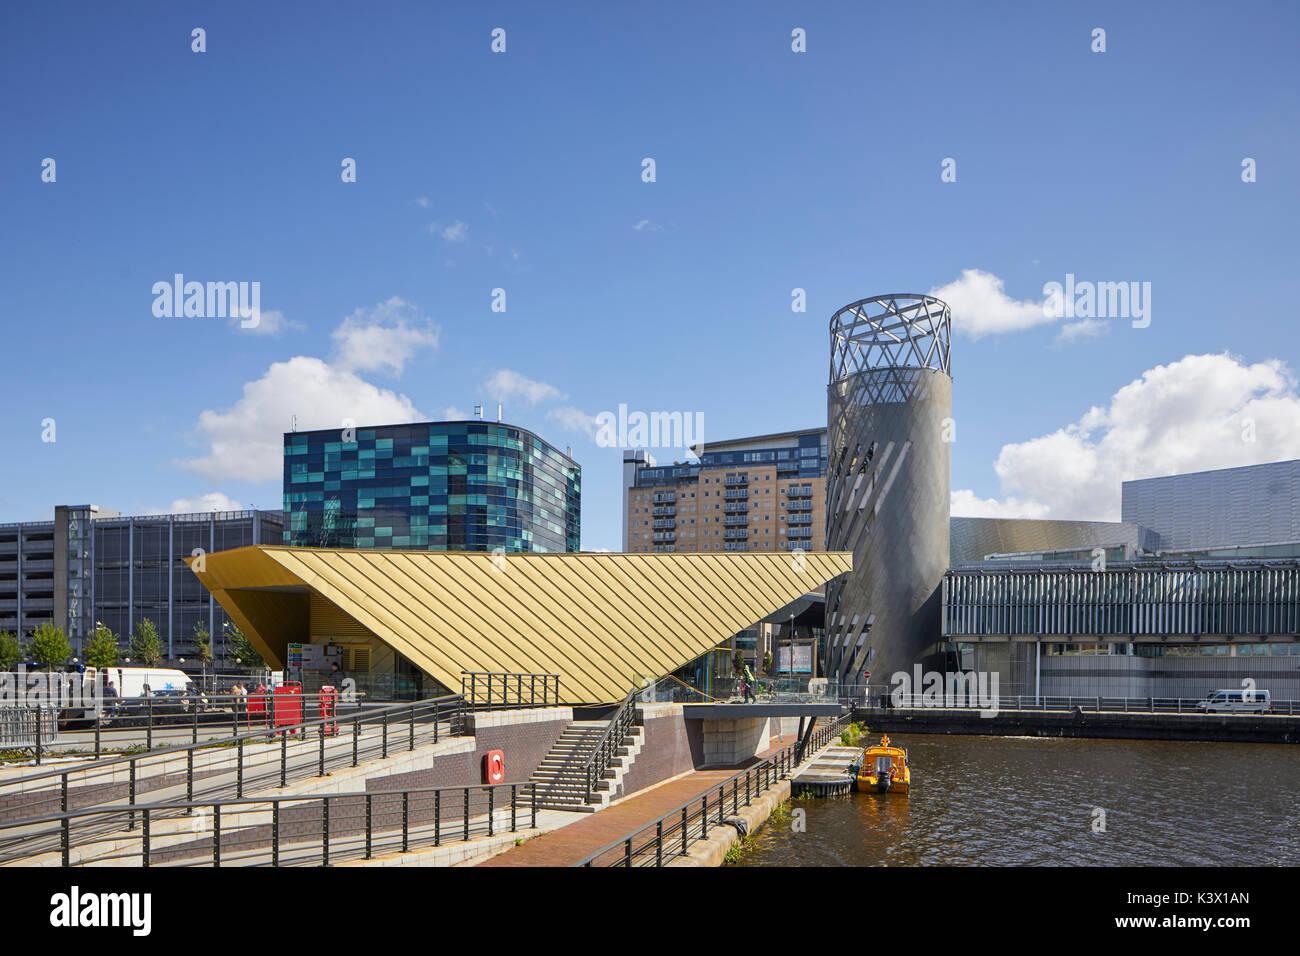 Regeneration docks area MediaCityUk at Salford Quays Gtr Manchester, gold modern architecture The Alchemist Bar Stock Photo